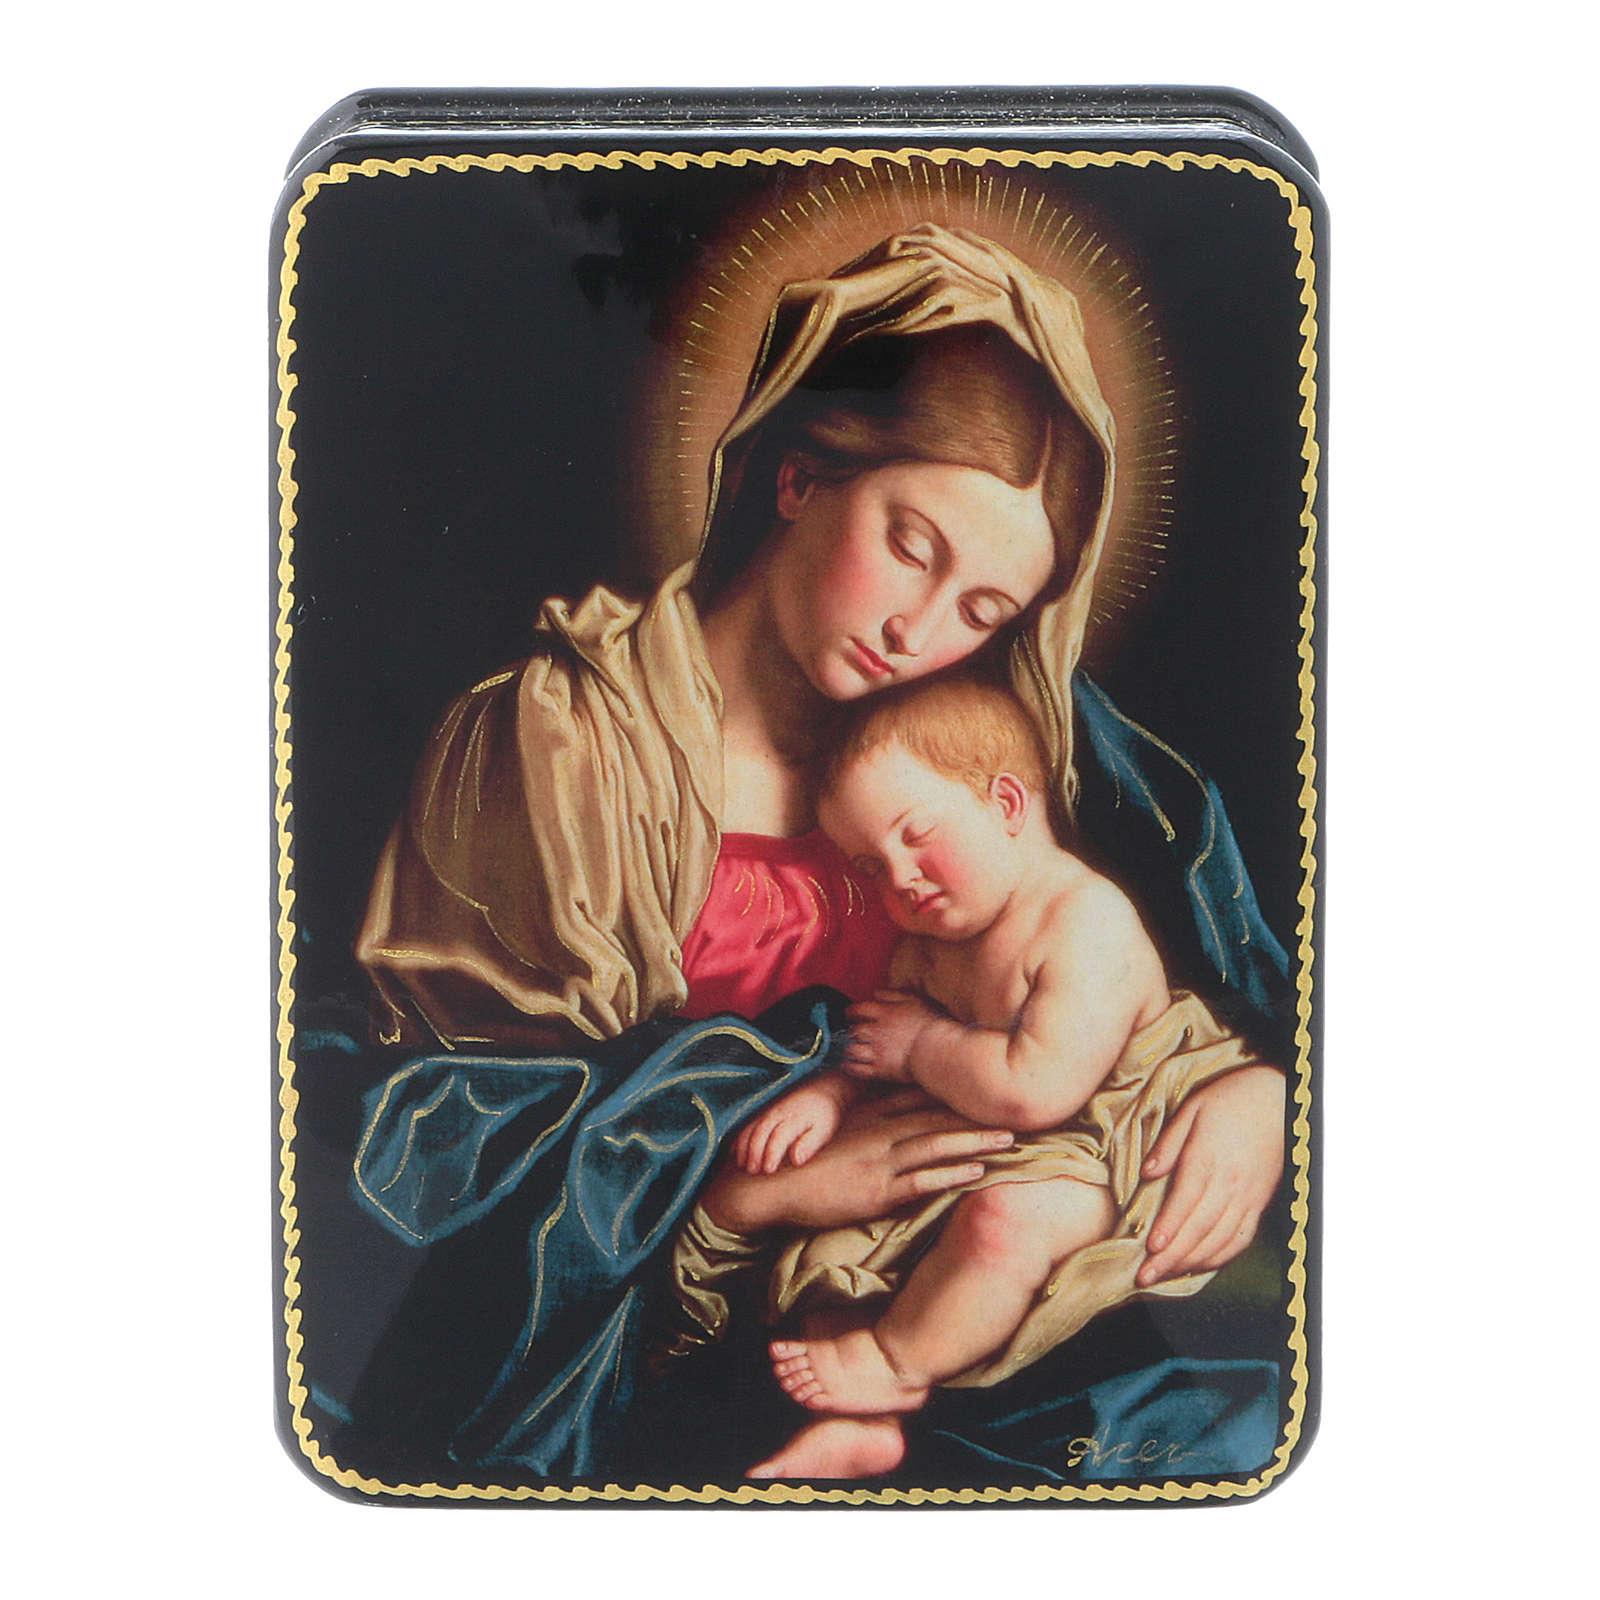 Scatola russa Papier-mâché Madonna con Bambino Sassoferrato Fedoskino style 11x8 4